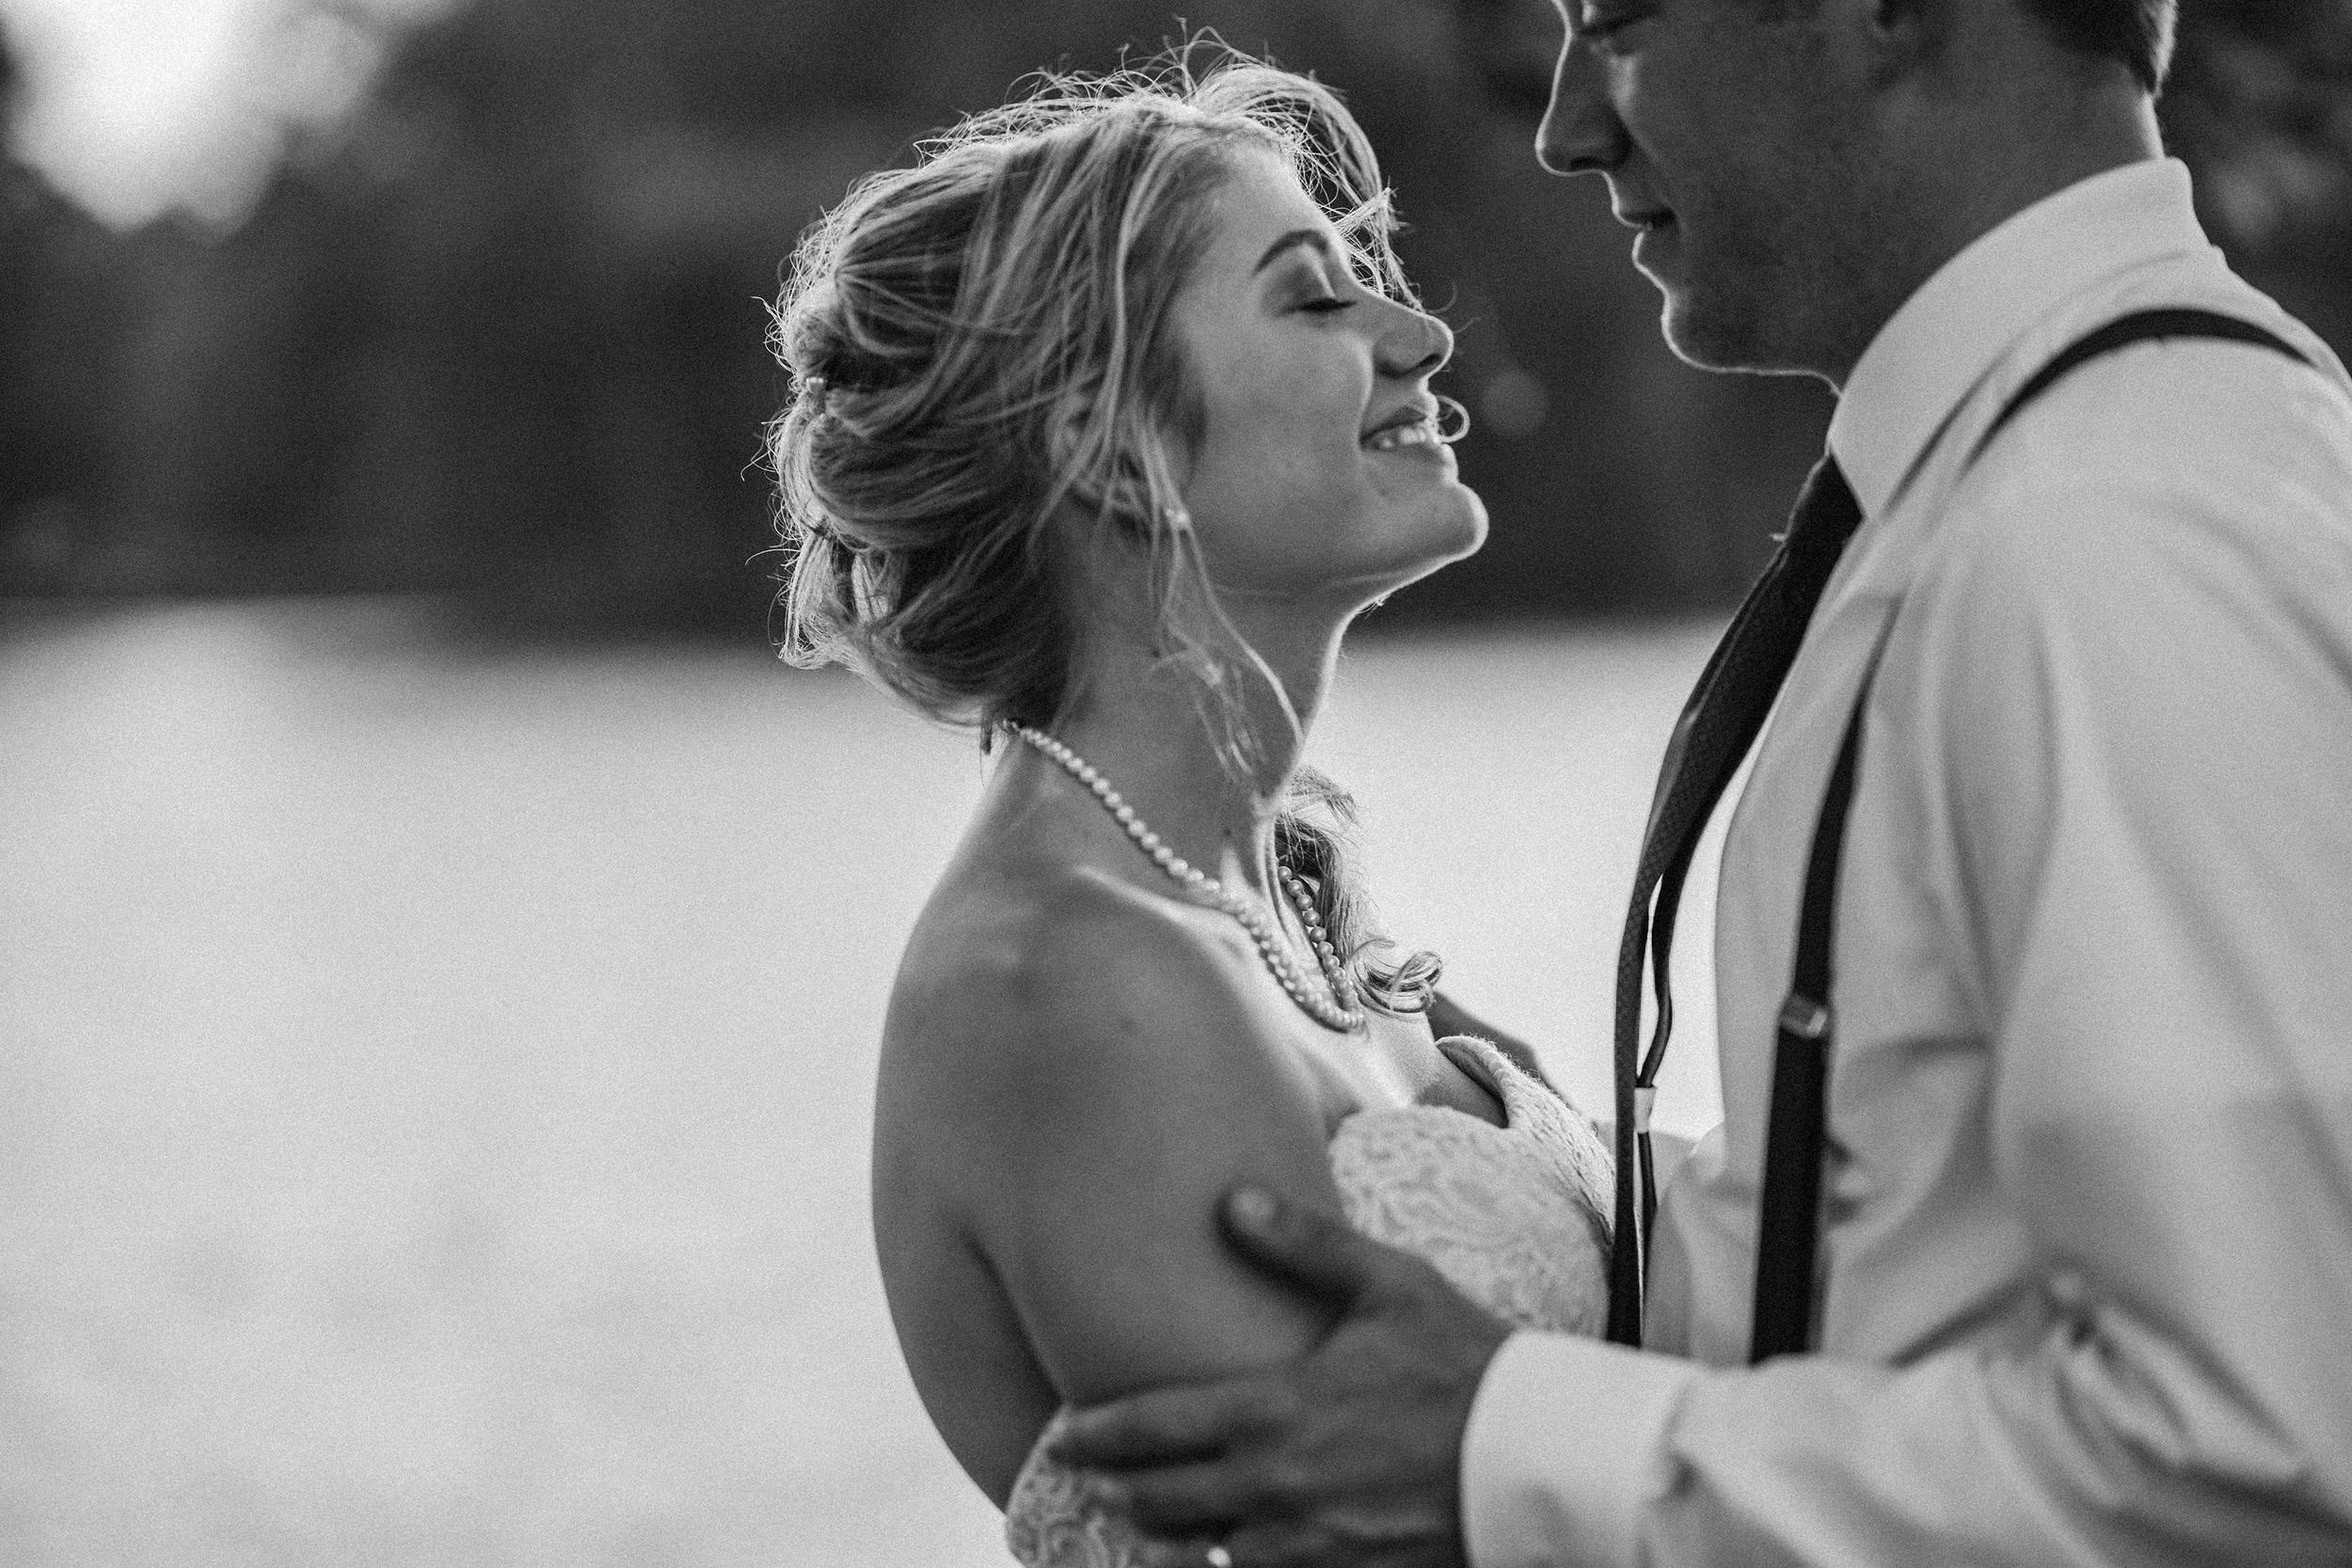 minnesota-wedding-photographer-midwest.jpg